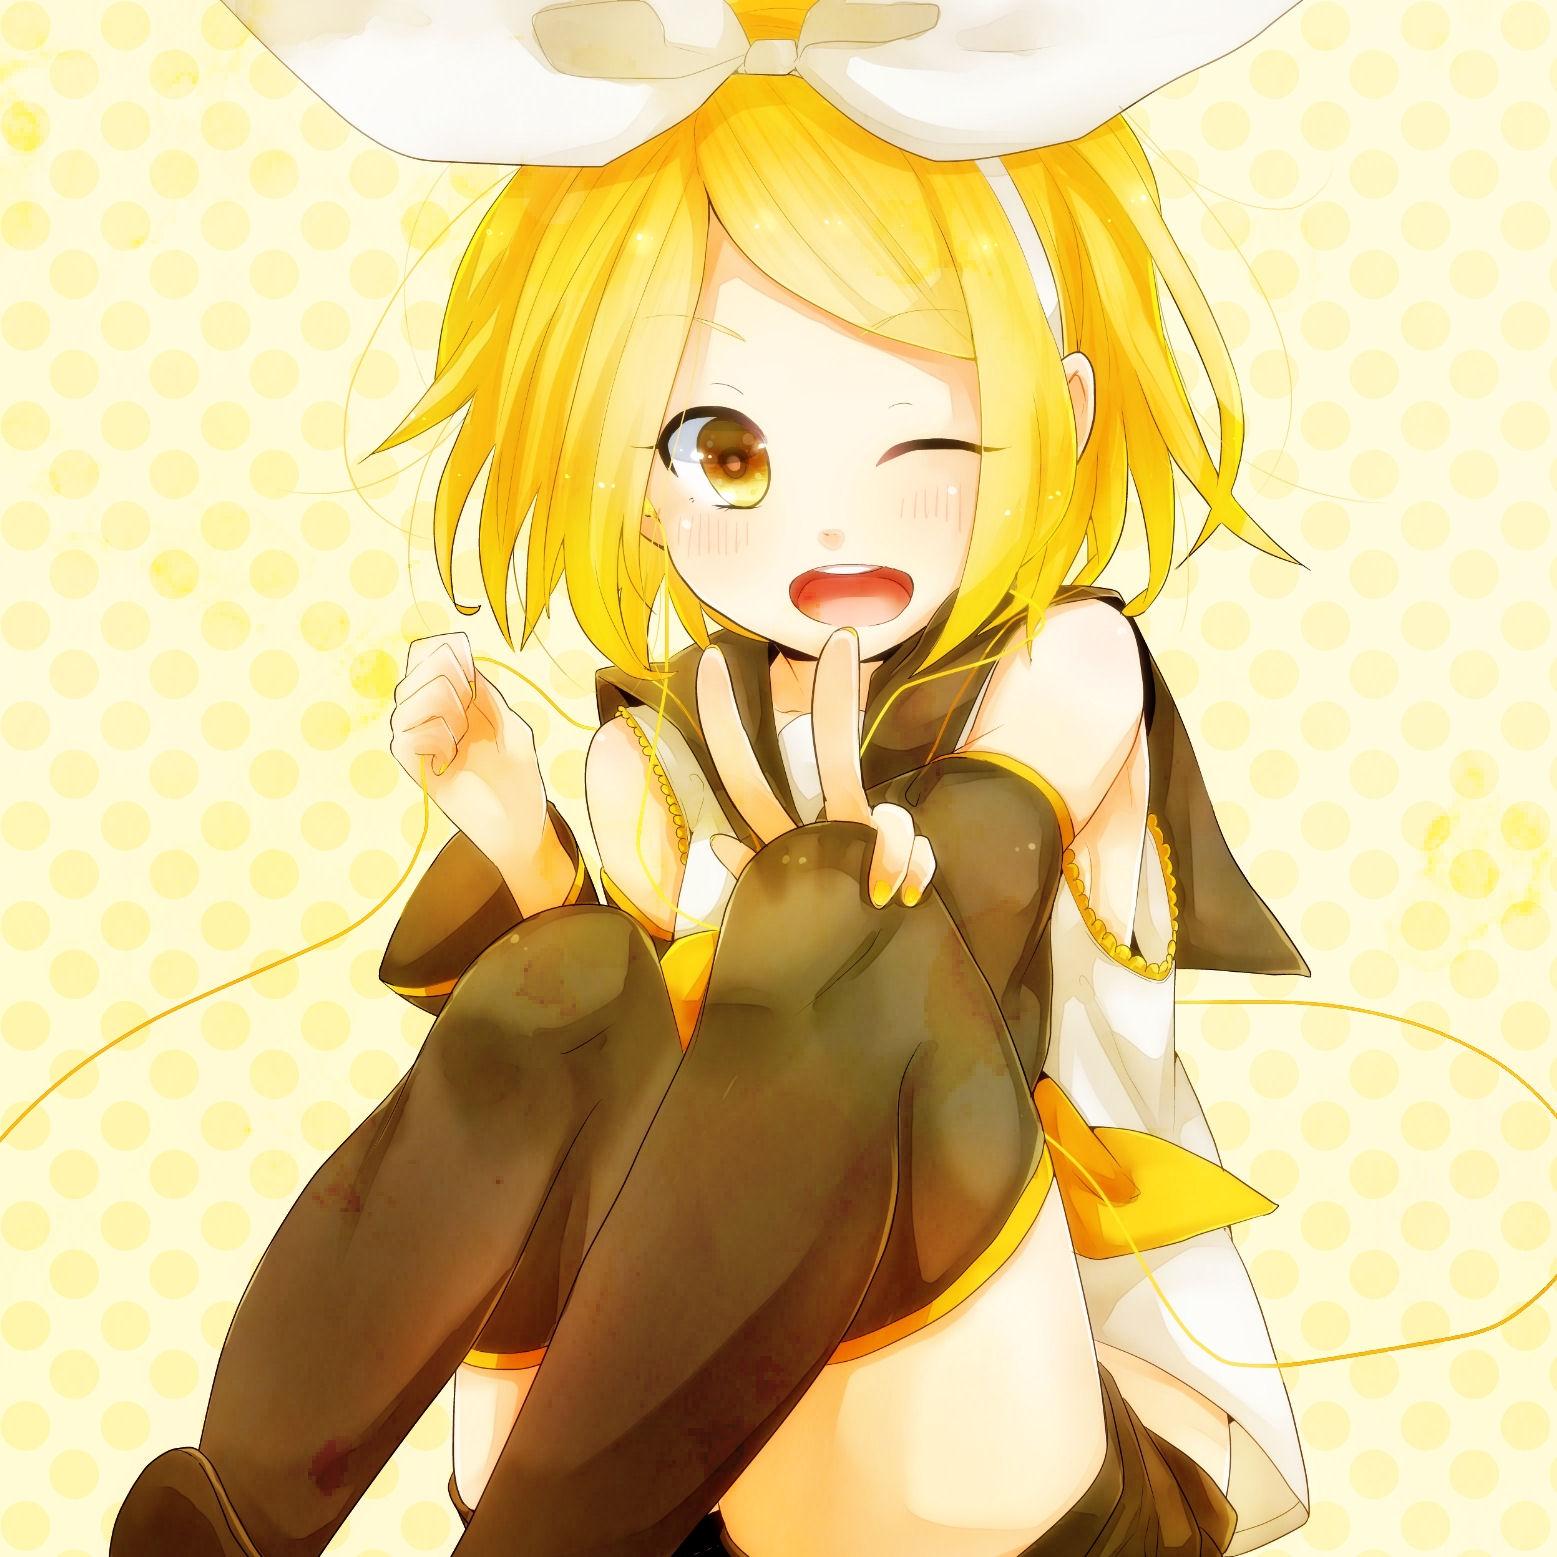 Kagamine Rin/#1116901 - Zerochan